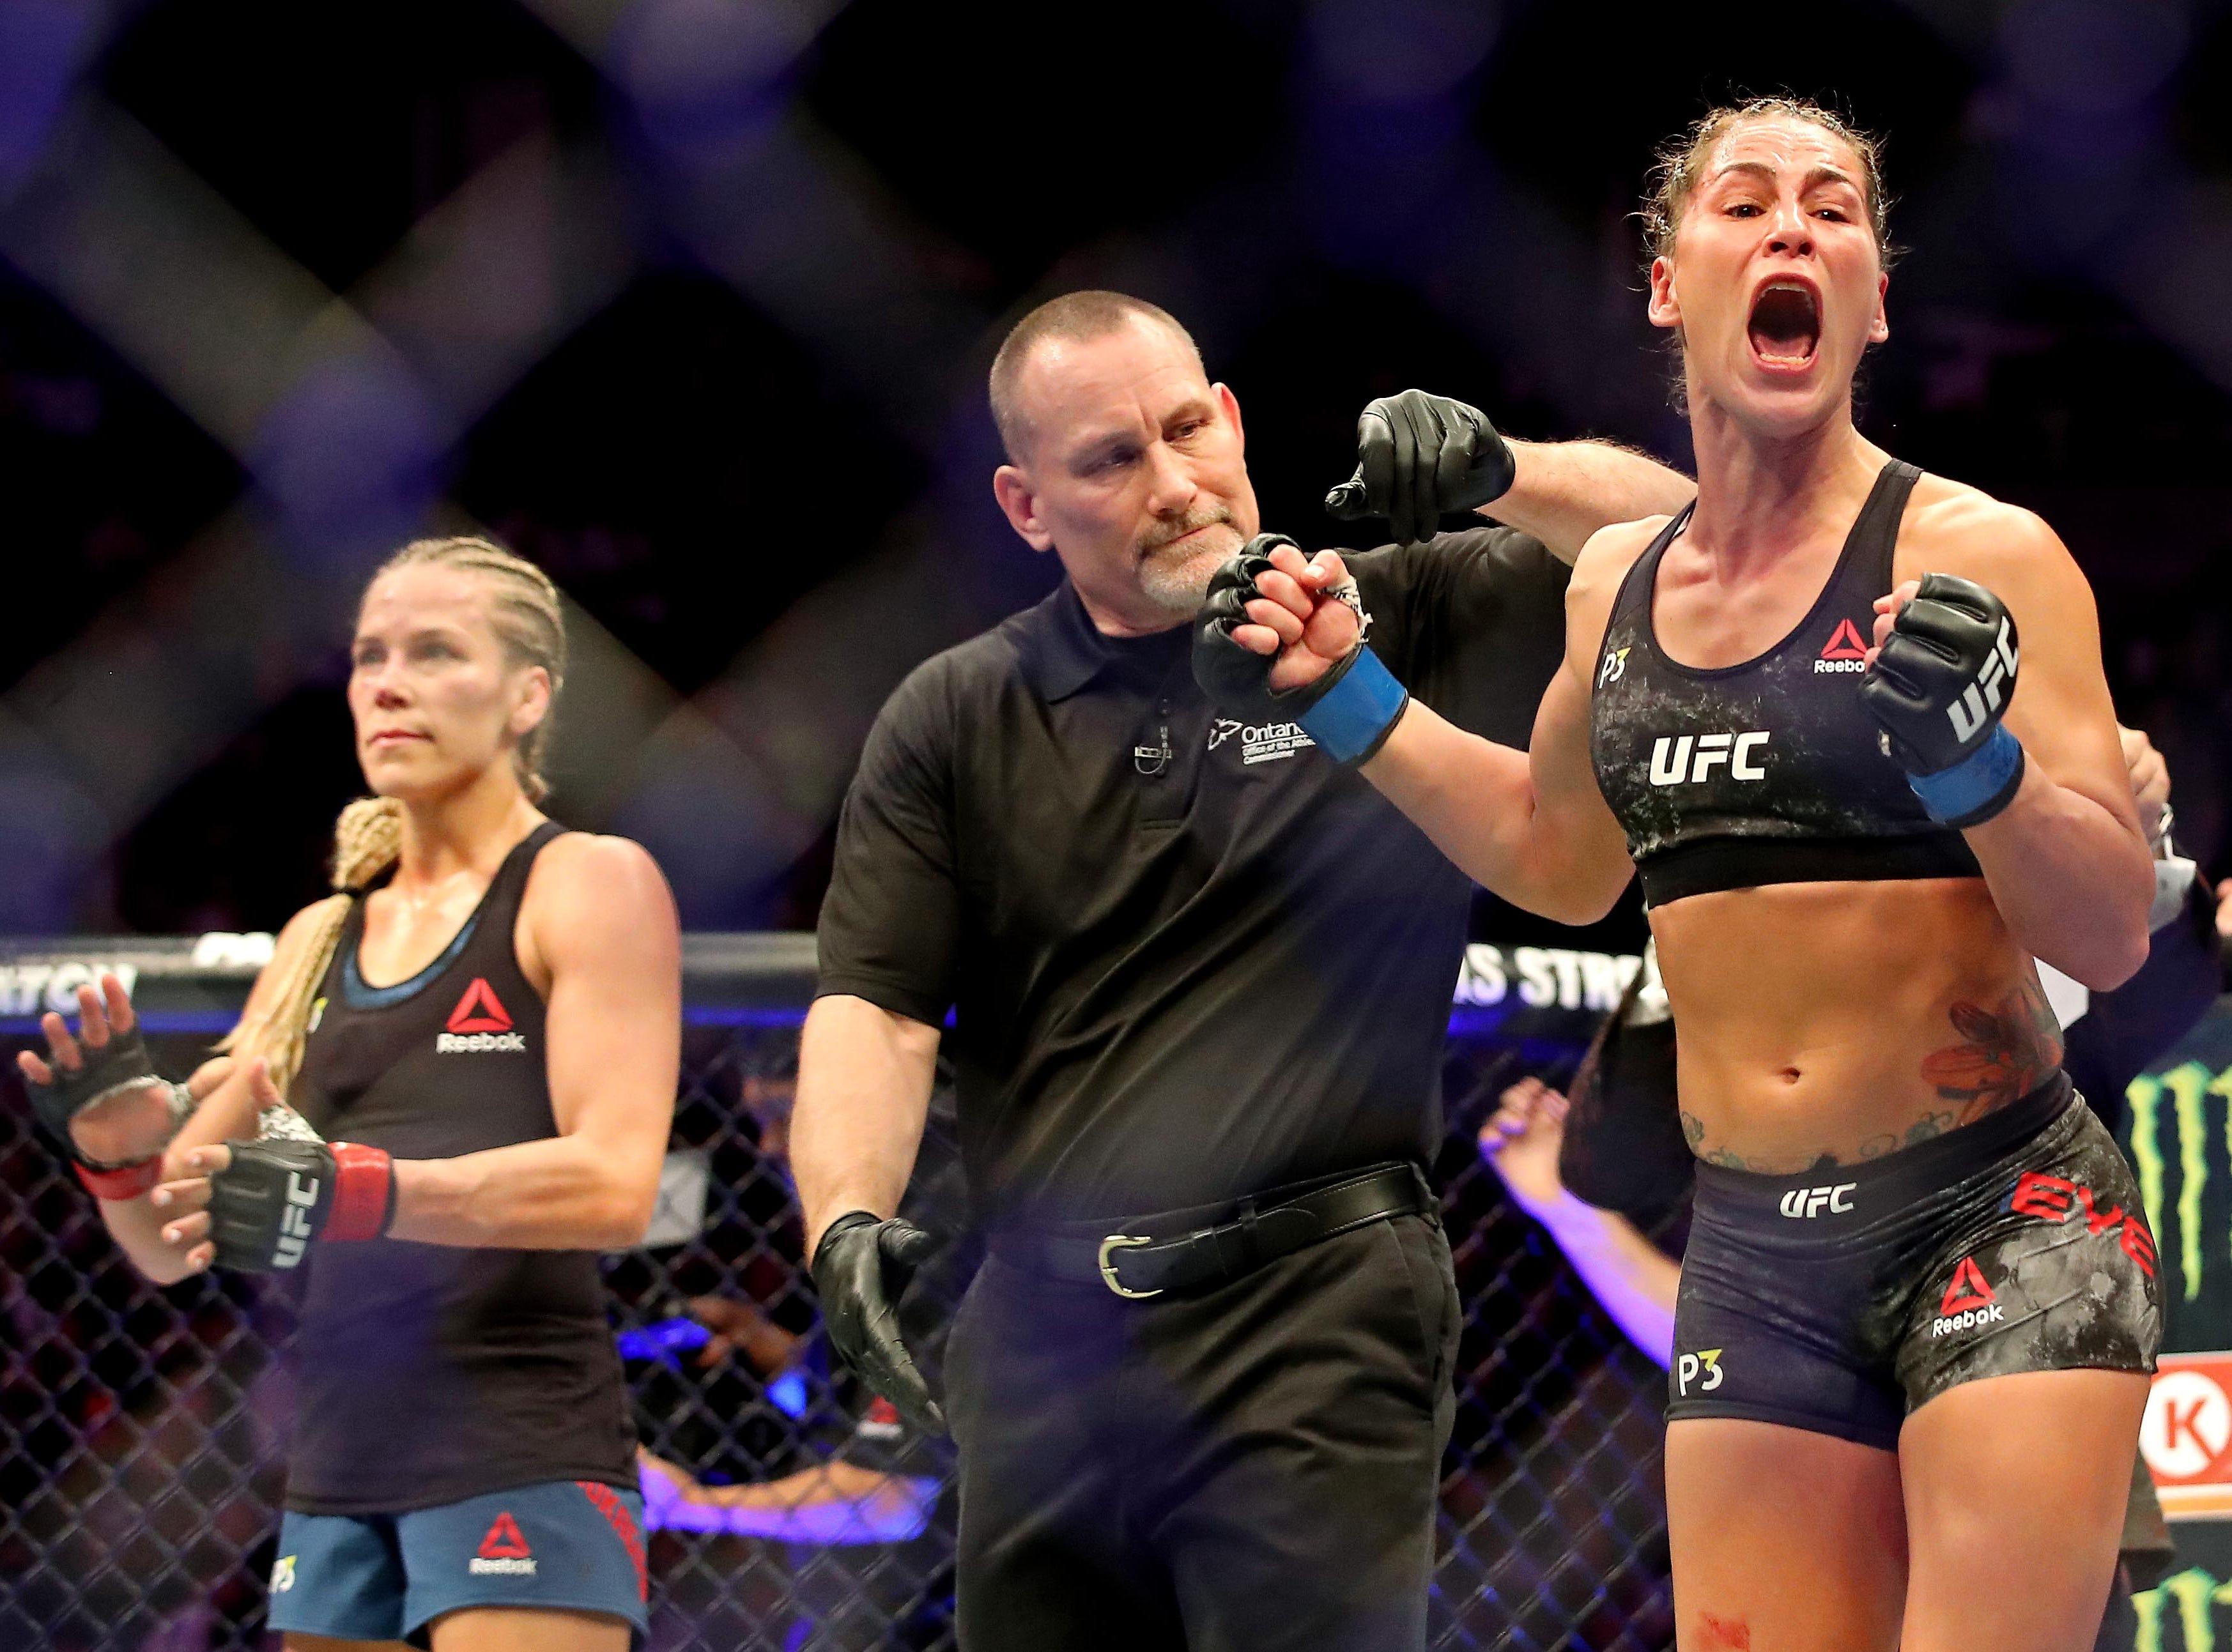 Jessica Eye (blue gloves) celebrates beating Katlyn Chookagian (red gloves) during UFC 231 at Scotiabank Arena.